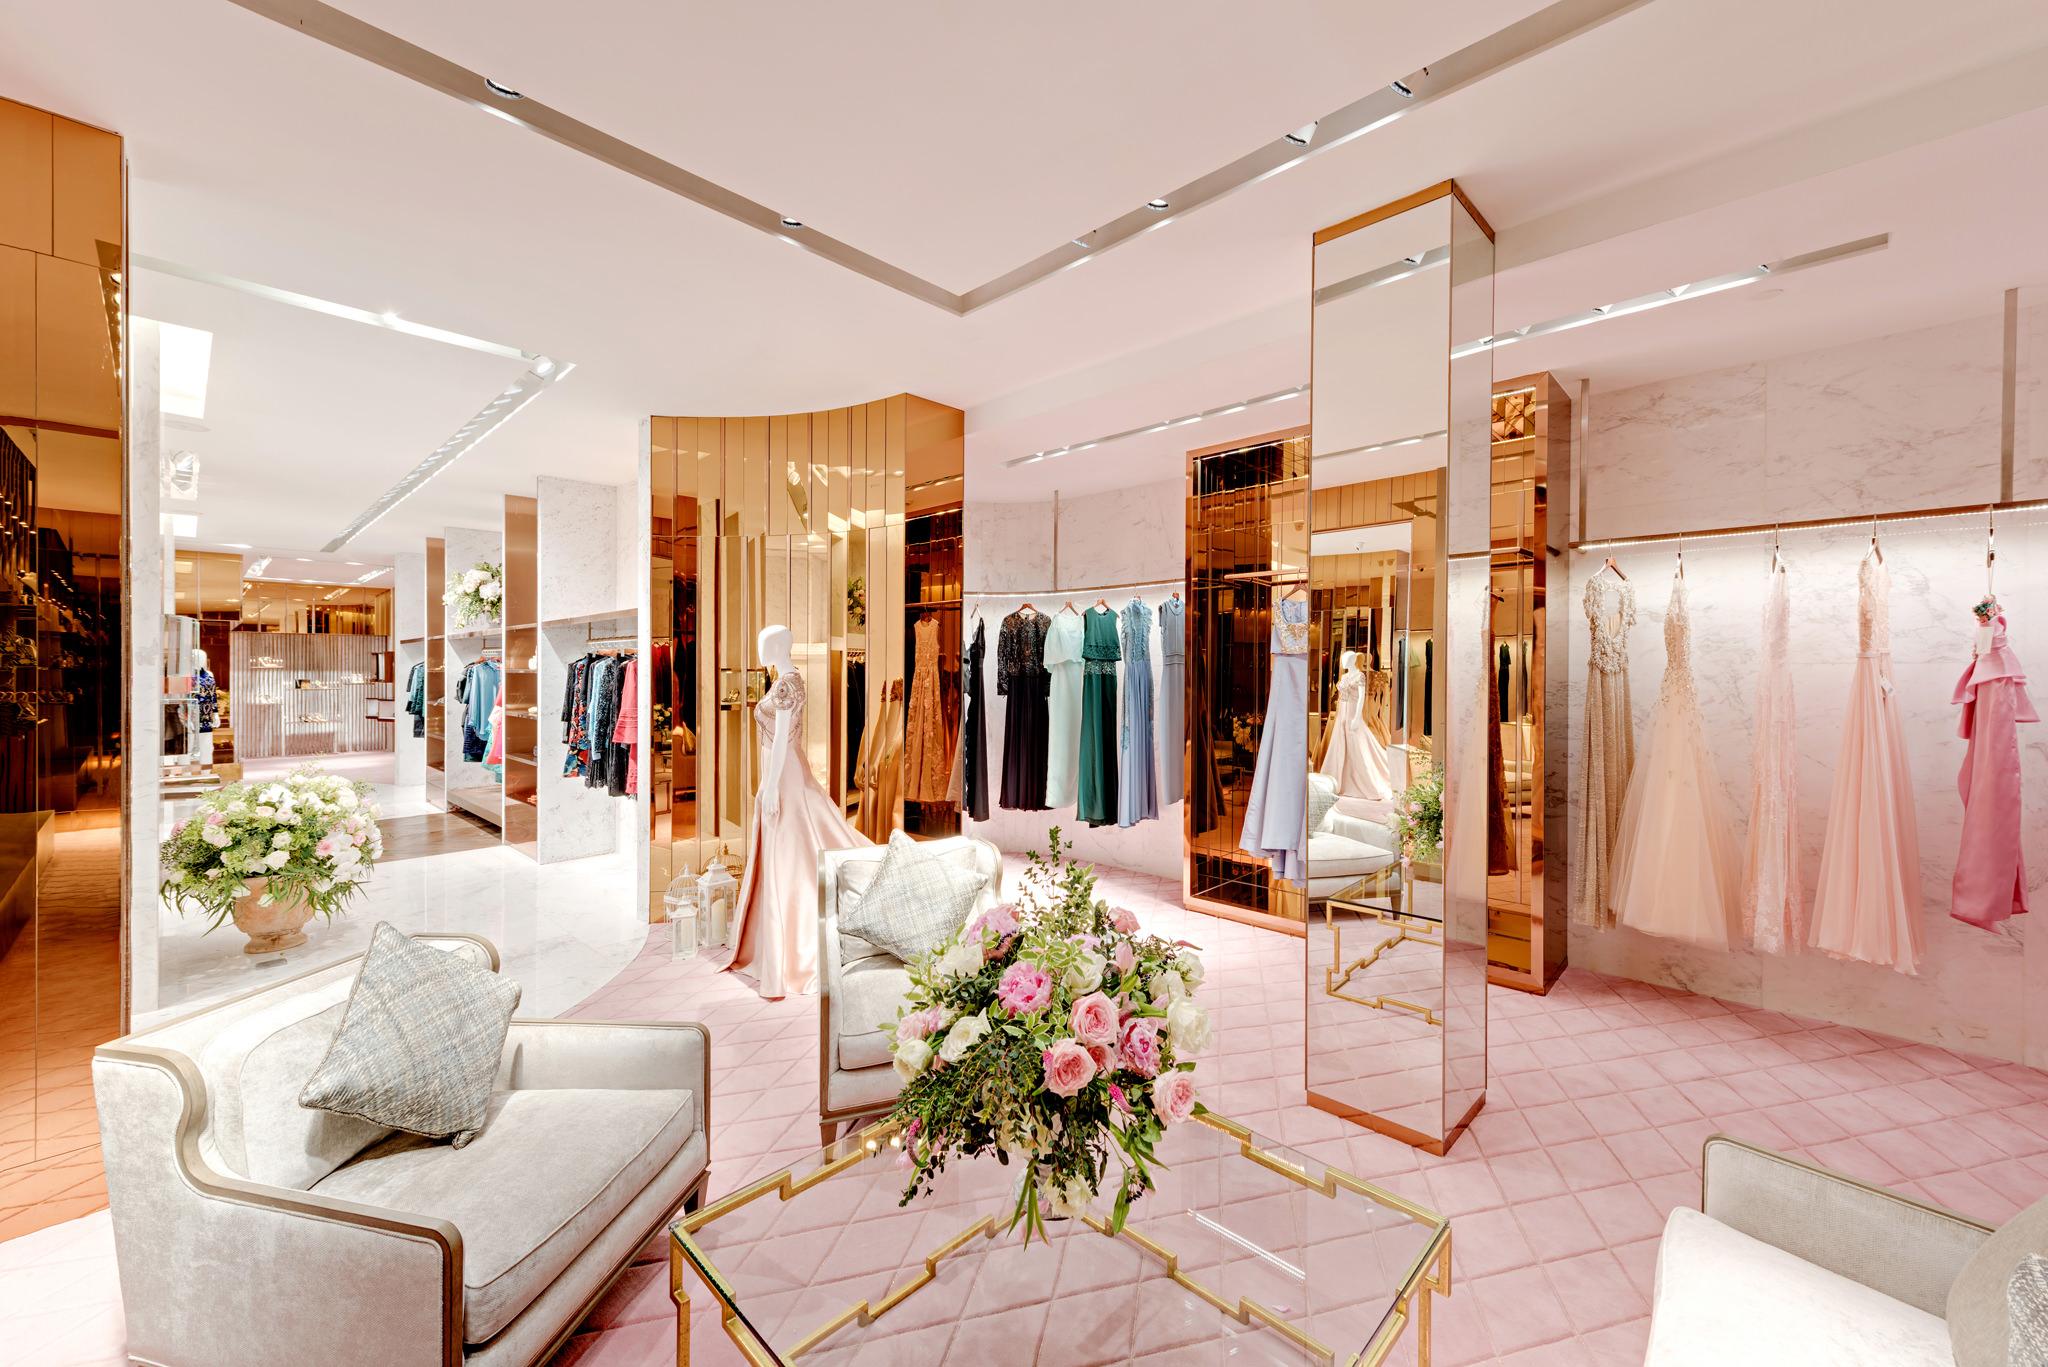 20161224 - Jacqueline - HCM - Commercial - Interior - Store - Retouch 0004.jpg